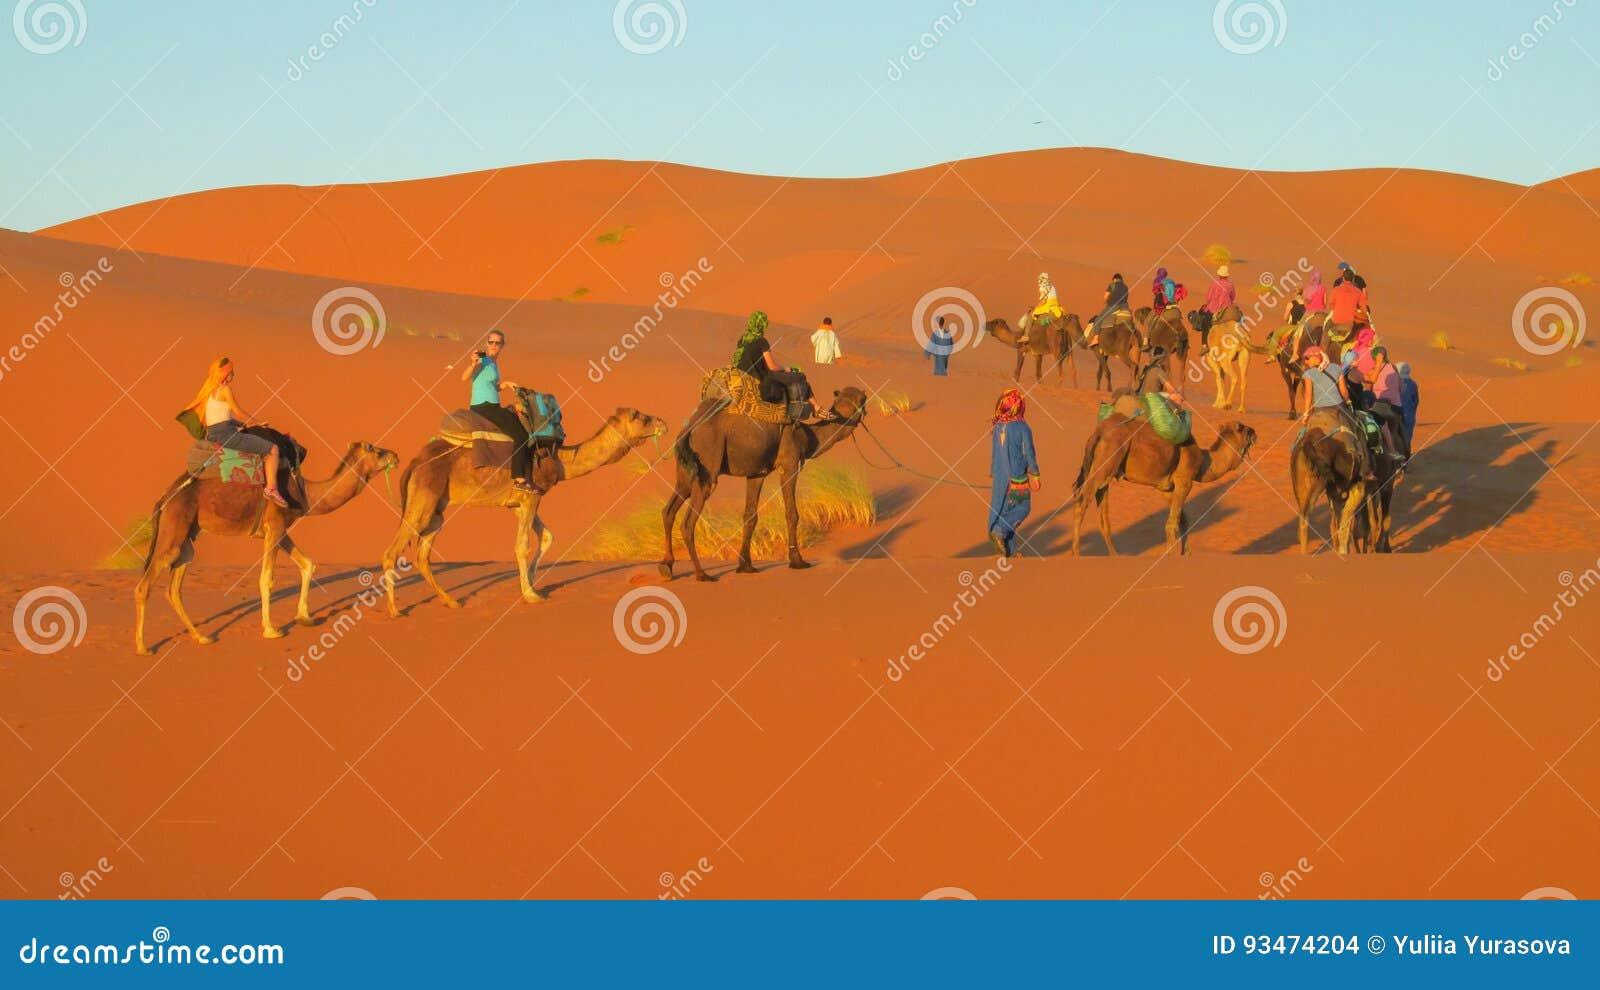 Touristic camel caravan in desert